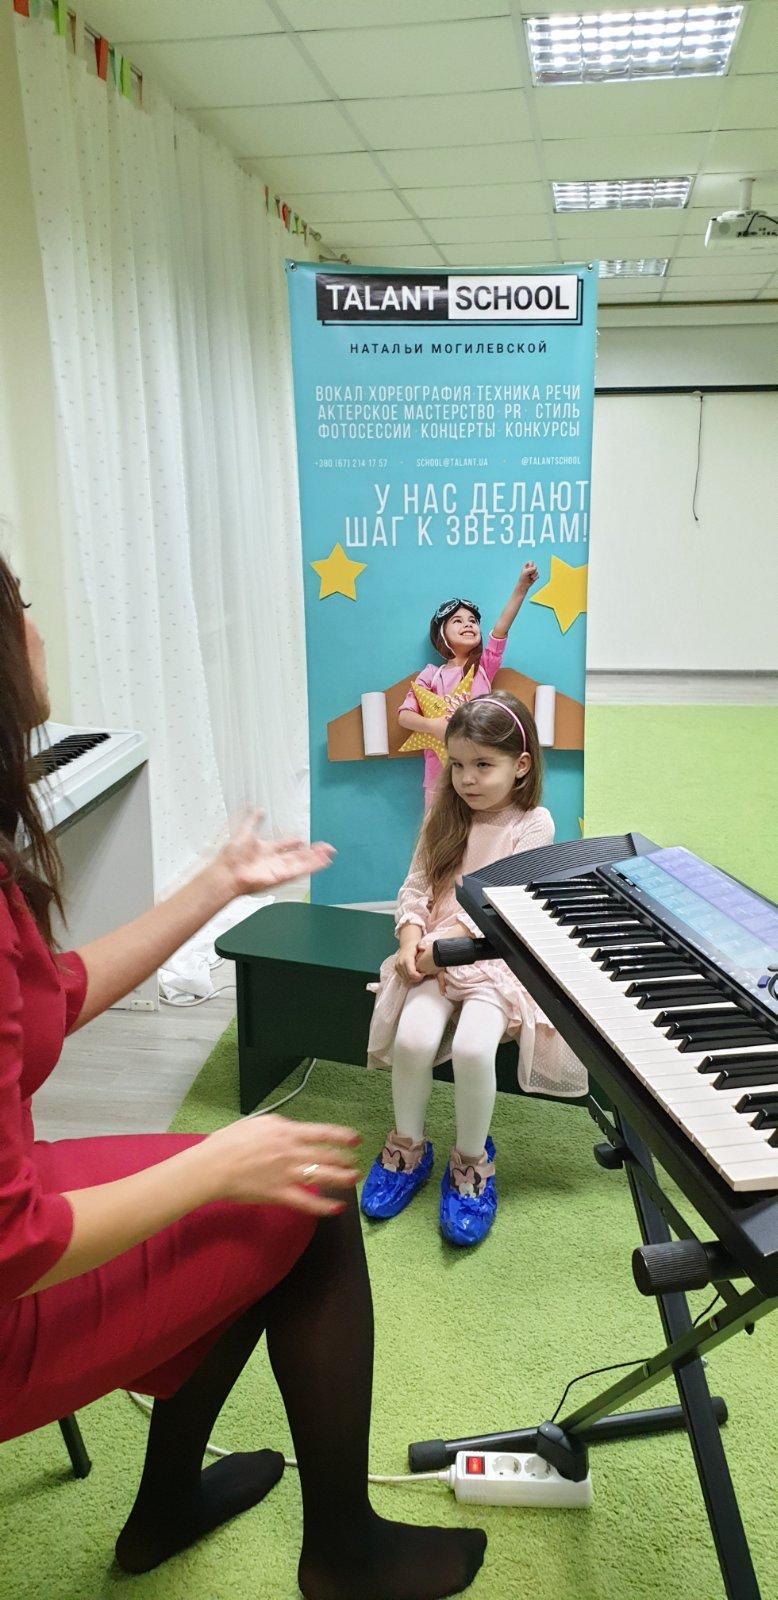 https://akademia-detstva.od.ua/app/uploads/2019/11/4-1.jpg